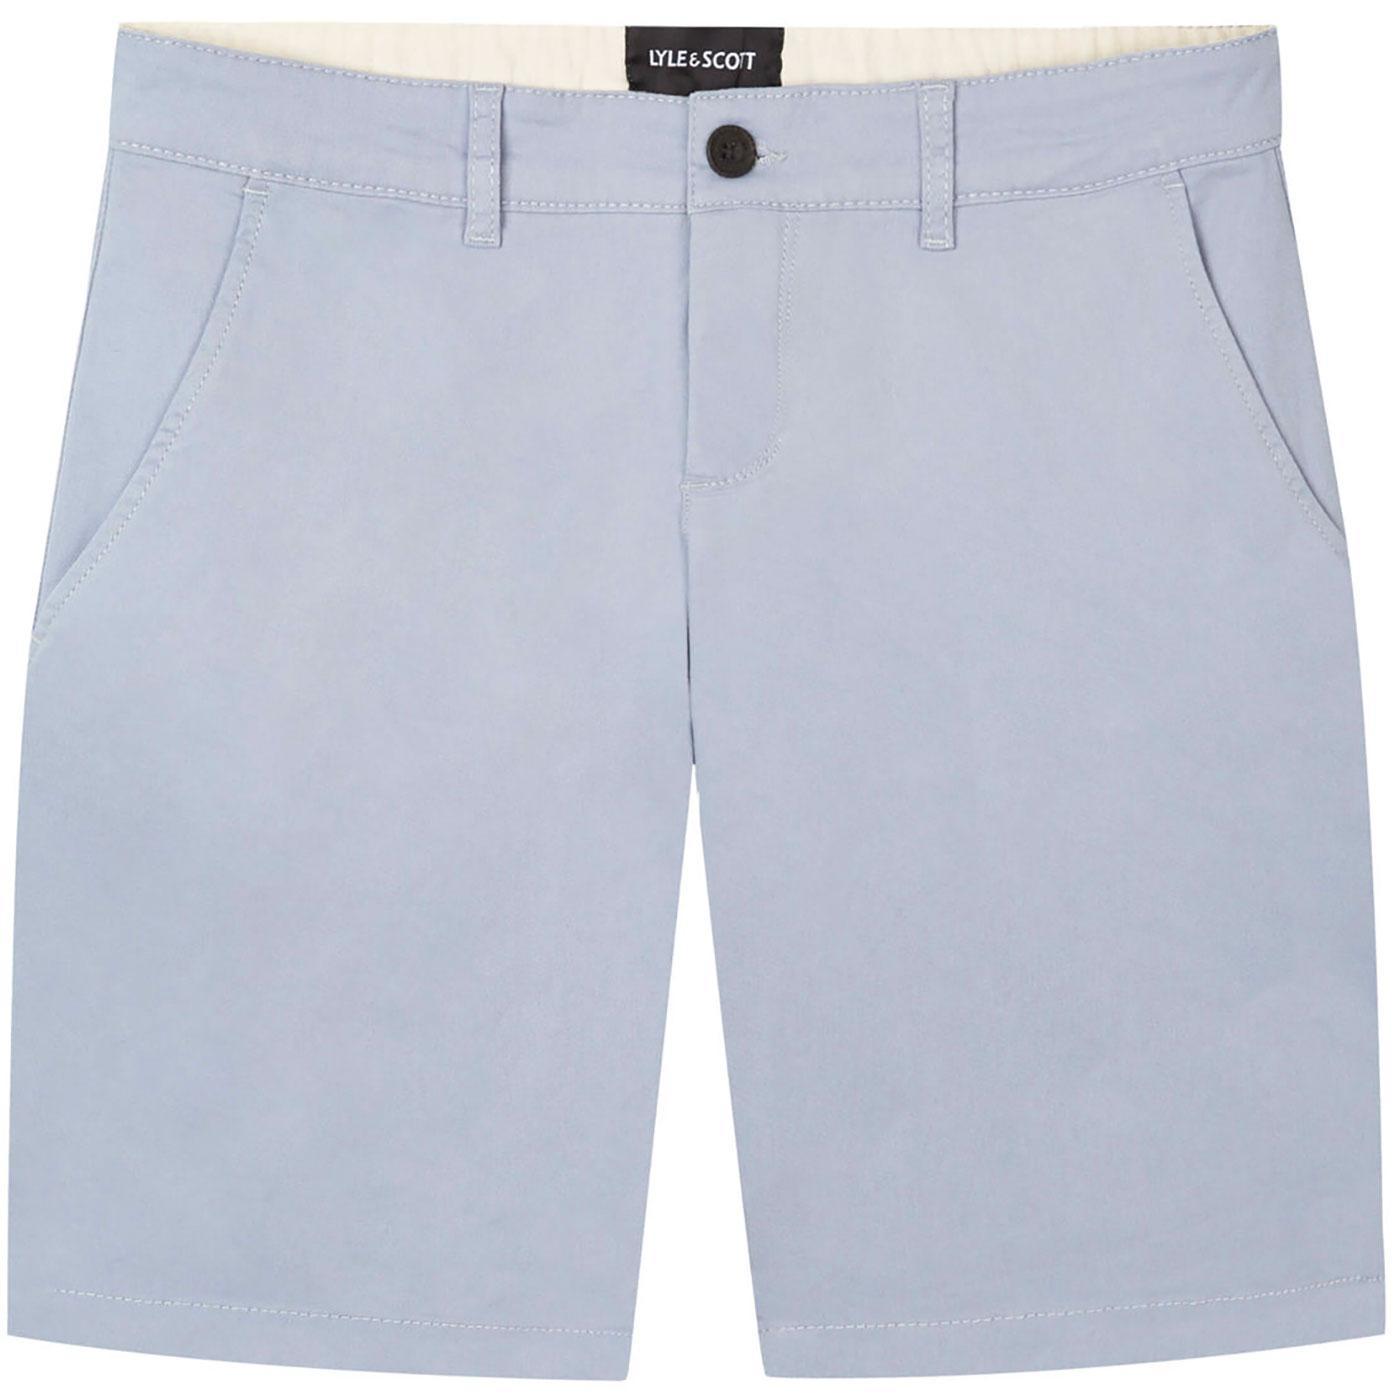 LYLE & SCOTT Men's Retro Chino Shorts (Cloud Blue)